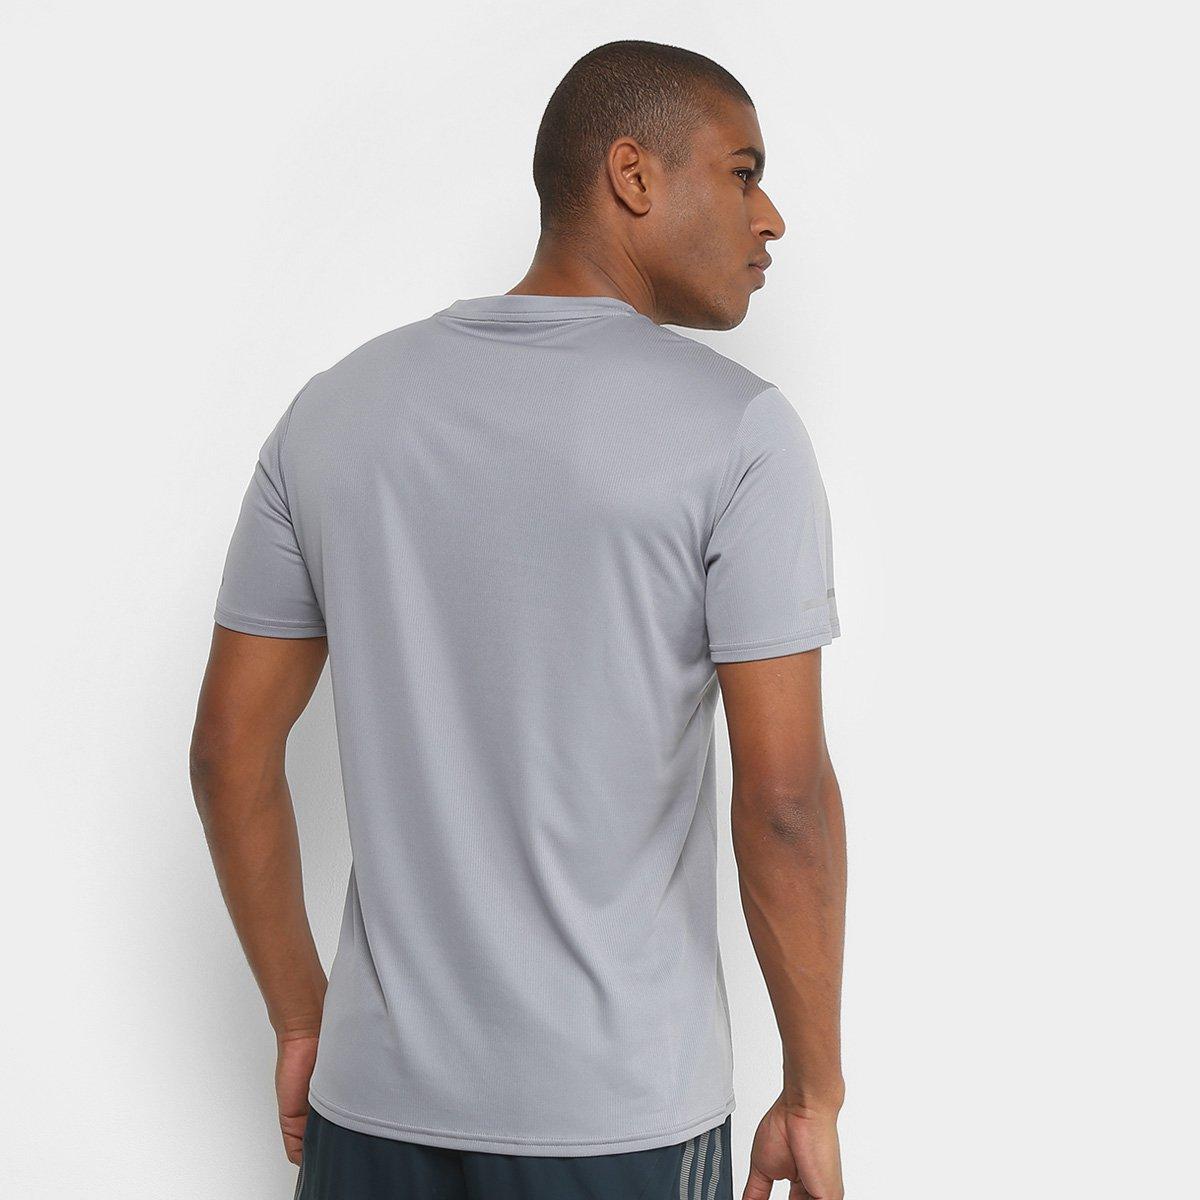 Camiseta Adidas Run Masculina  Camiseta Adidas Run Masculina ... 8cd11f68774bb